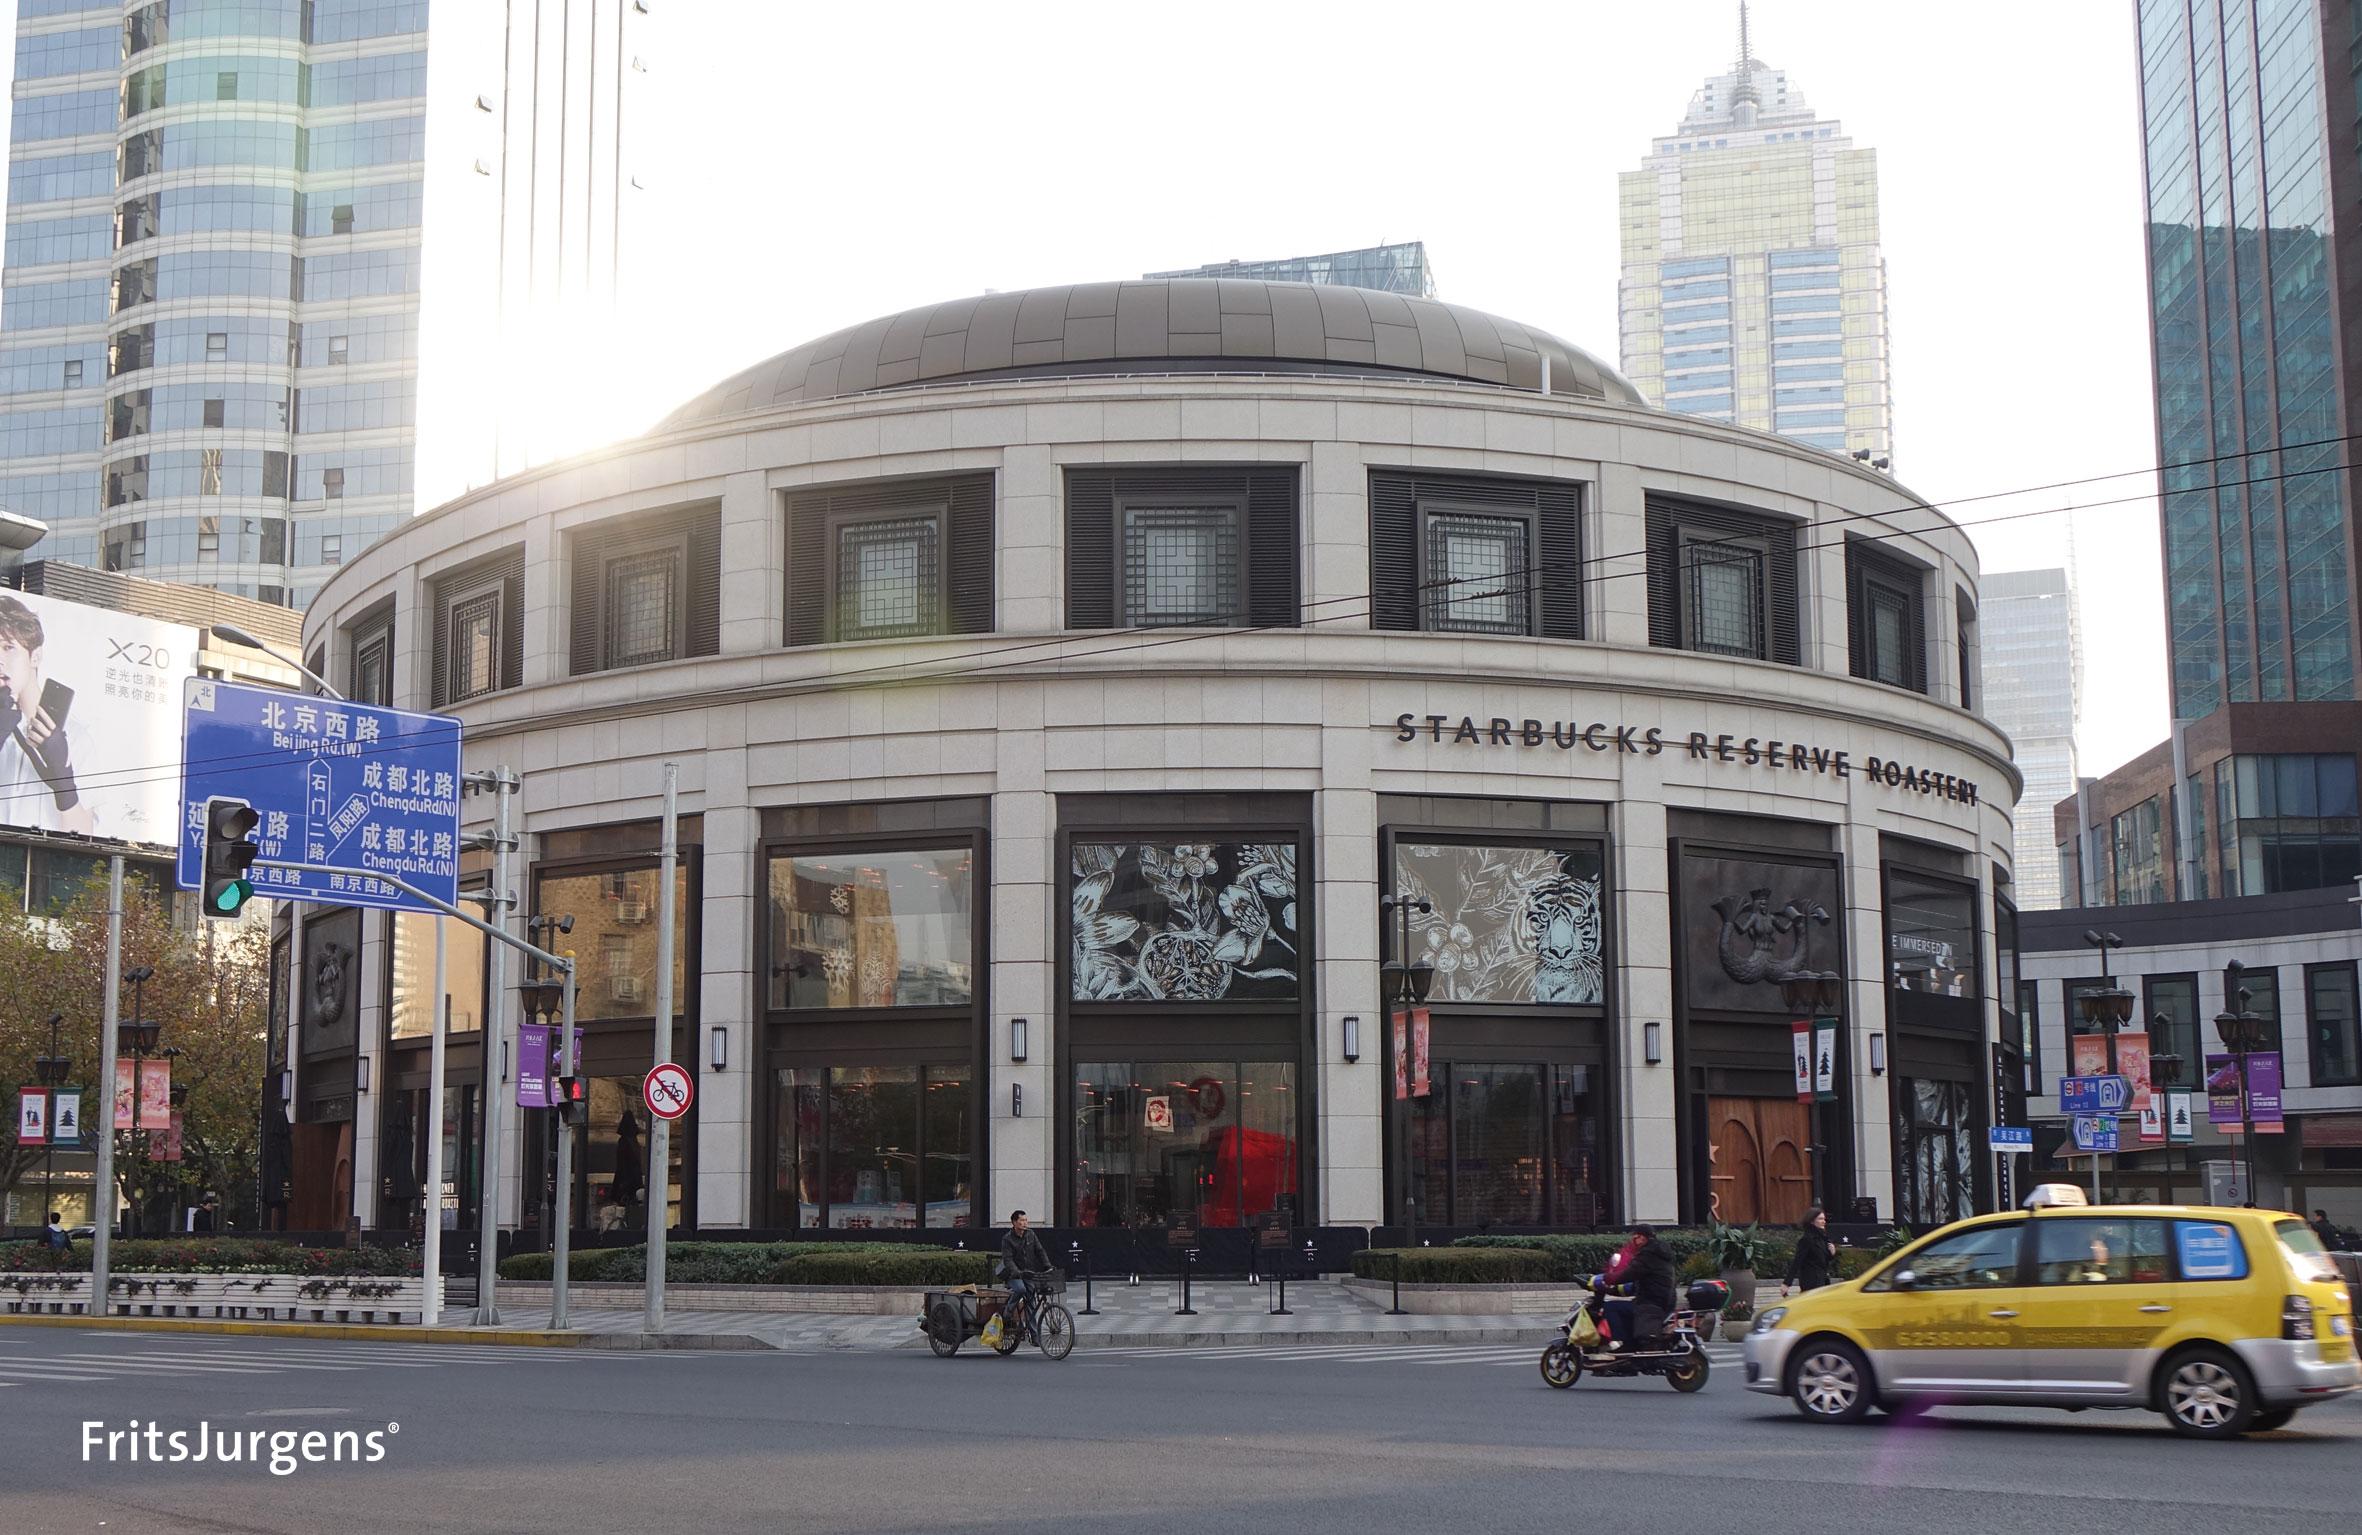 Exterior of the new Starbucks Roastery in Shanghai.